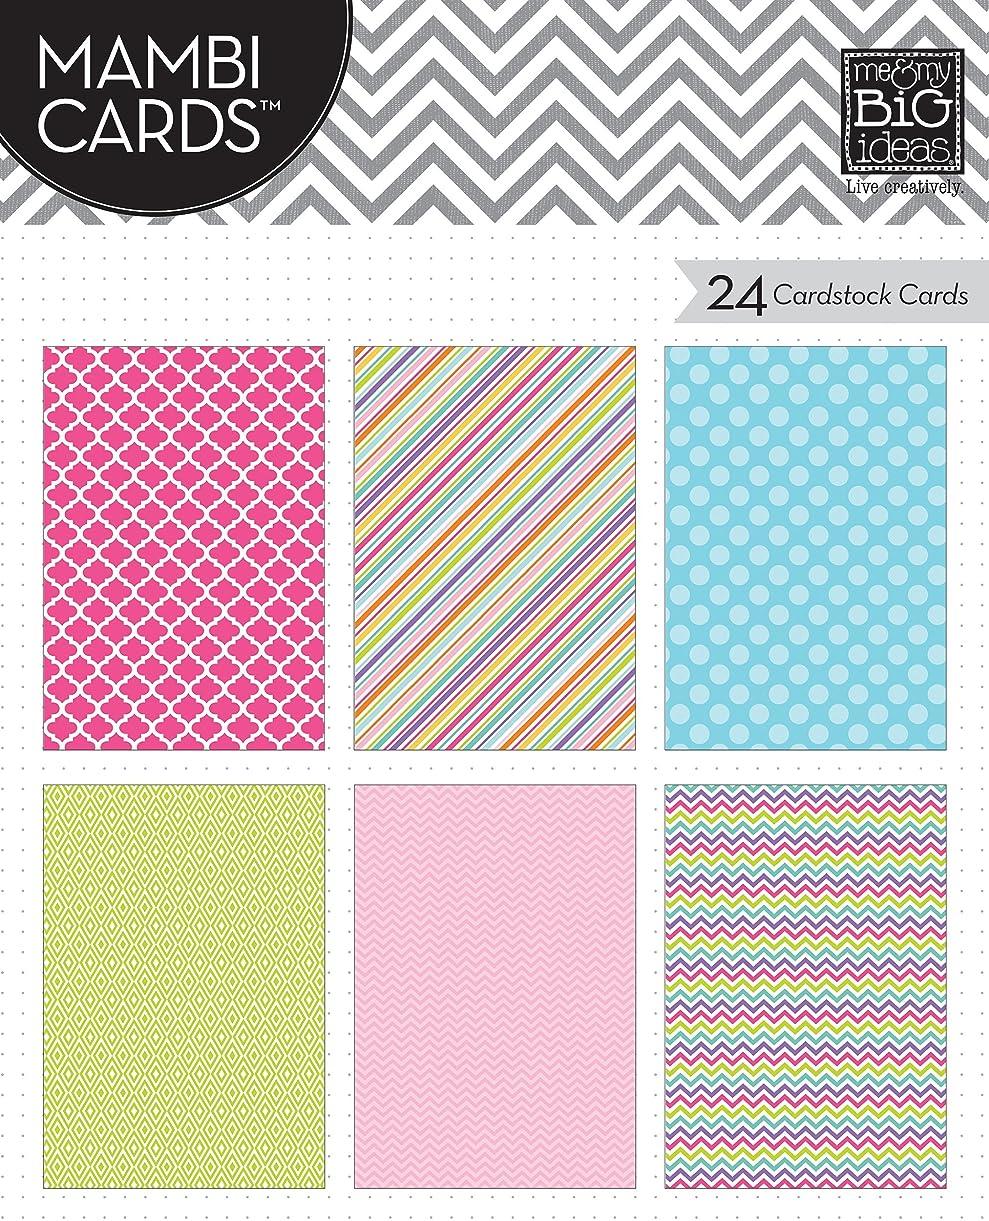 me & my BIG ideas Pocket Pages Mambi Cards, Brights koddi9346